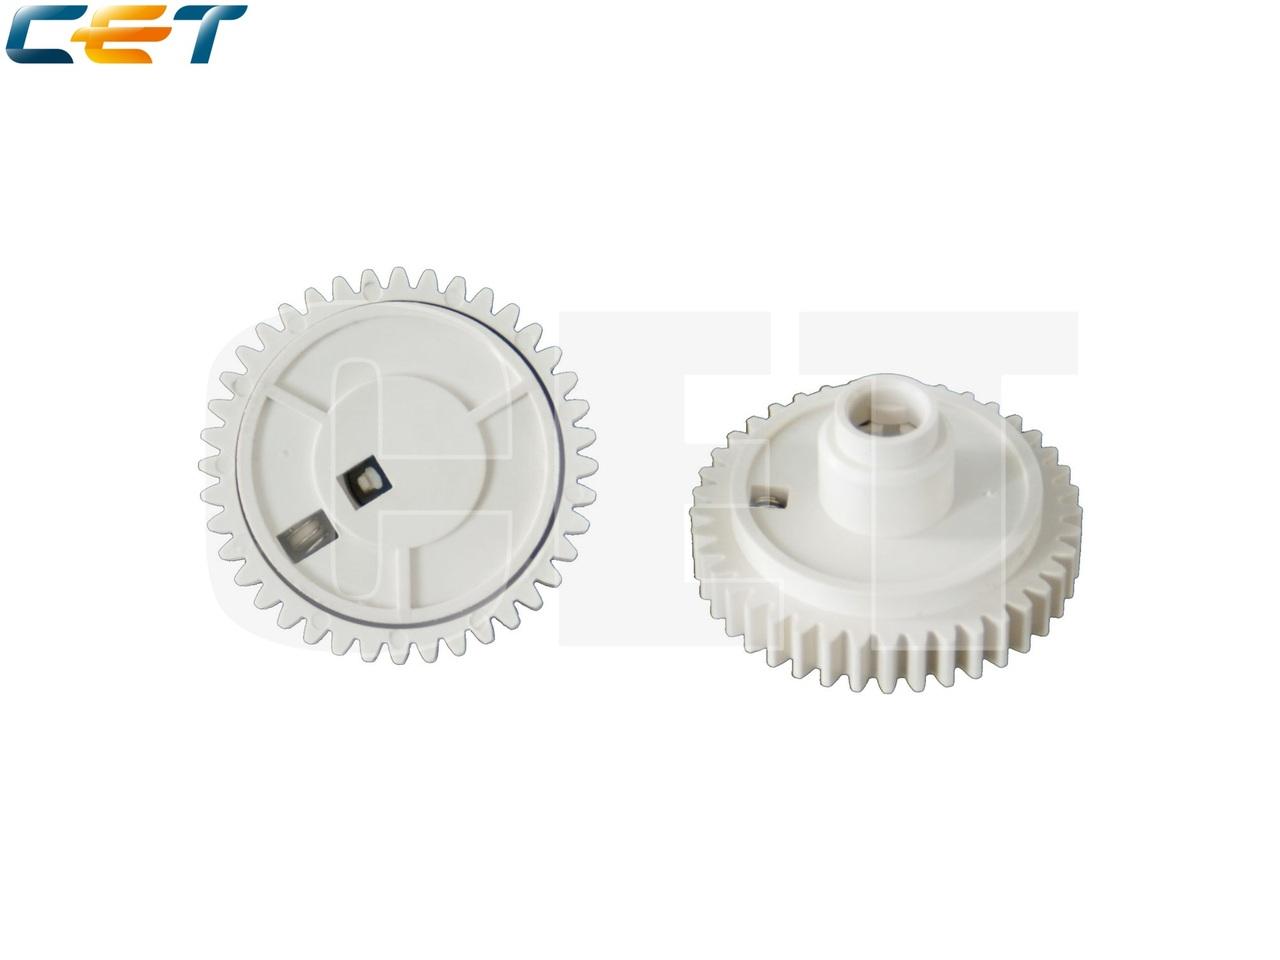 Шестерня привода резинового вала 40T RC1-3324-000 для HPLaserJet 4250/4350 (CET), CET5888